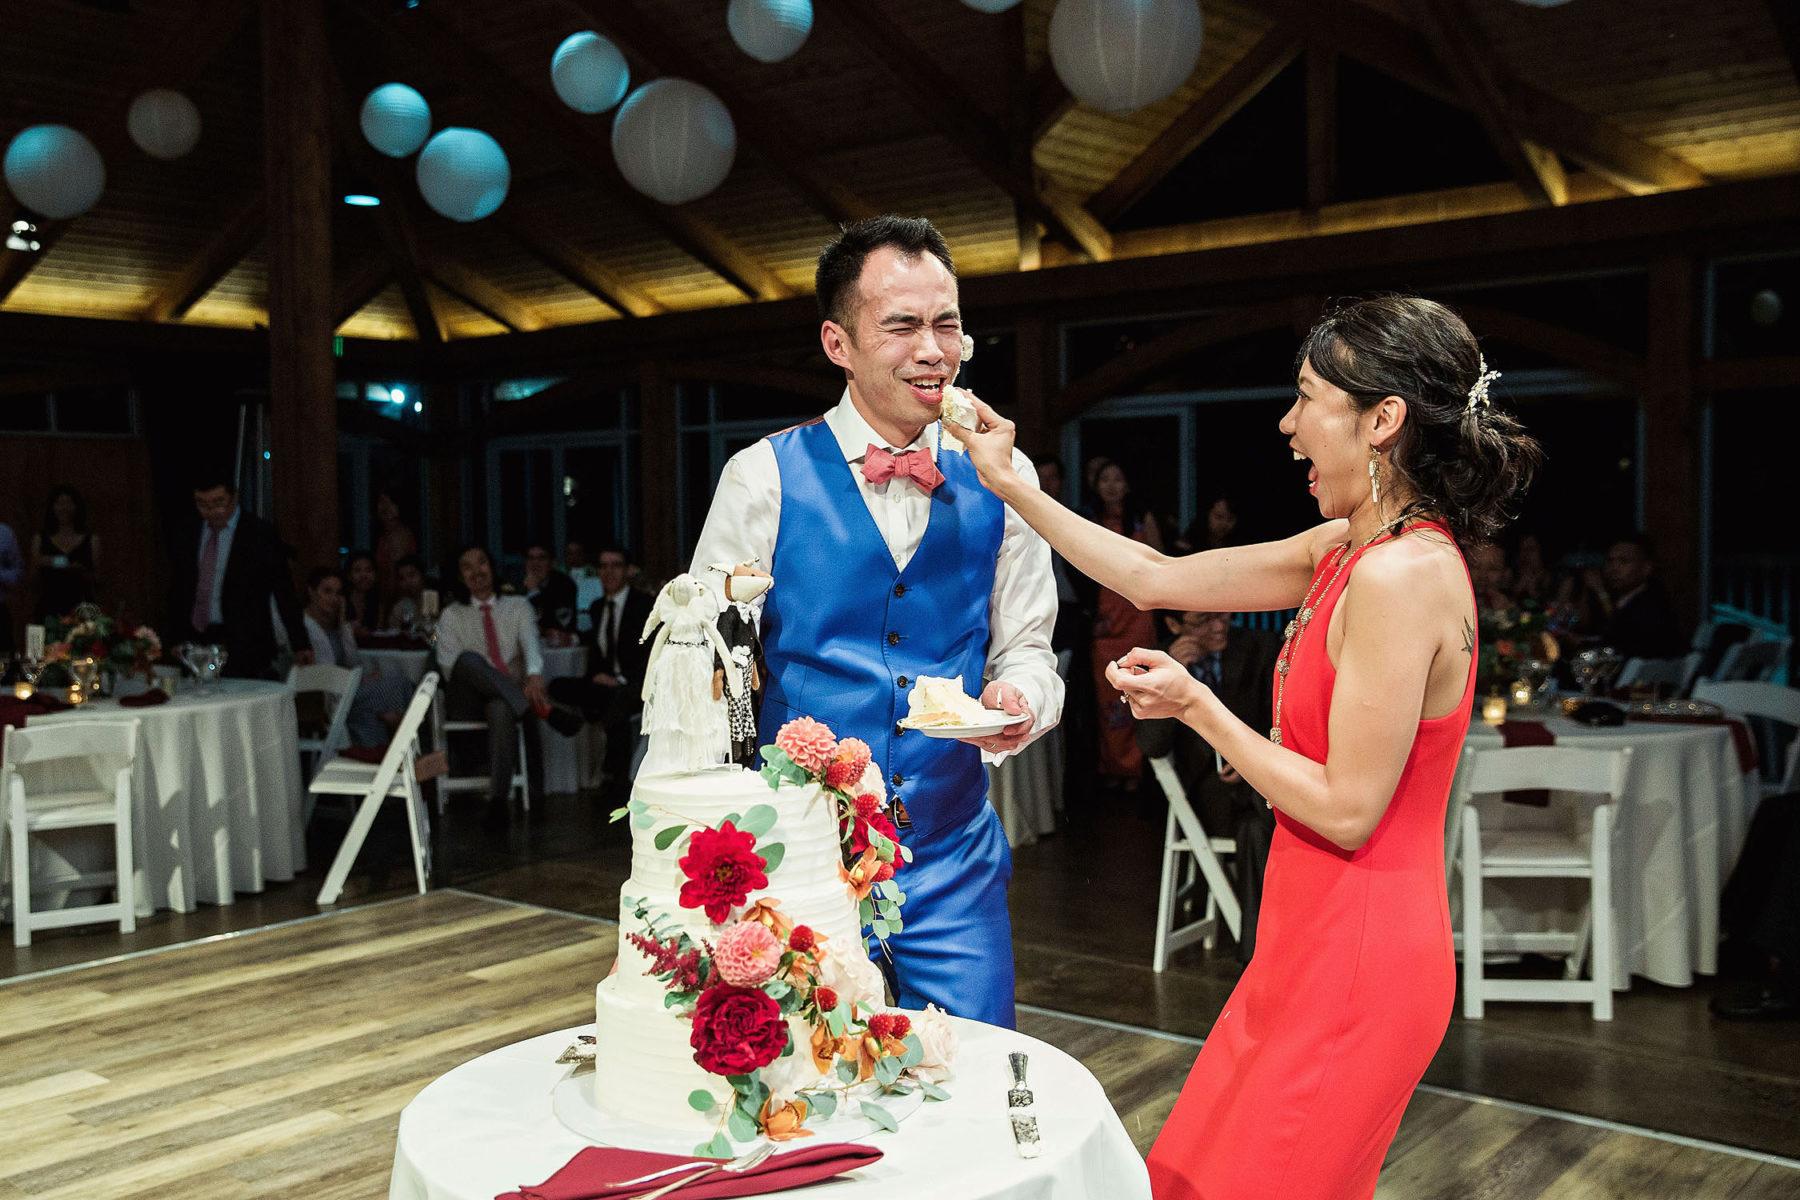 Hudson Valley Mountain House Wedding Photographer